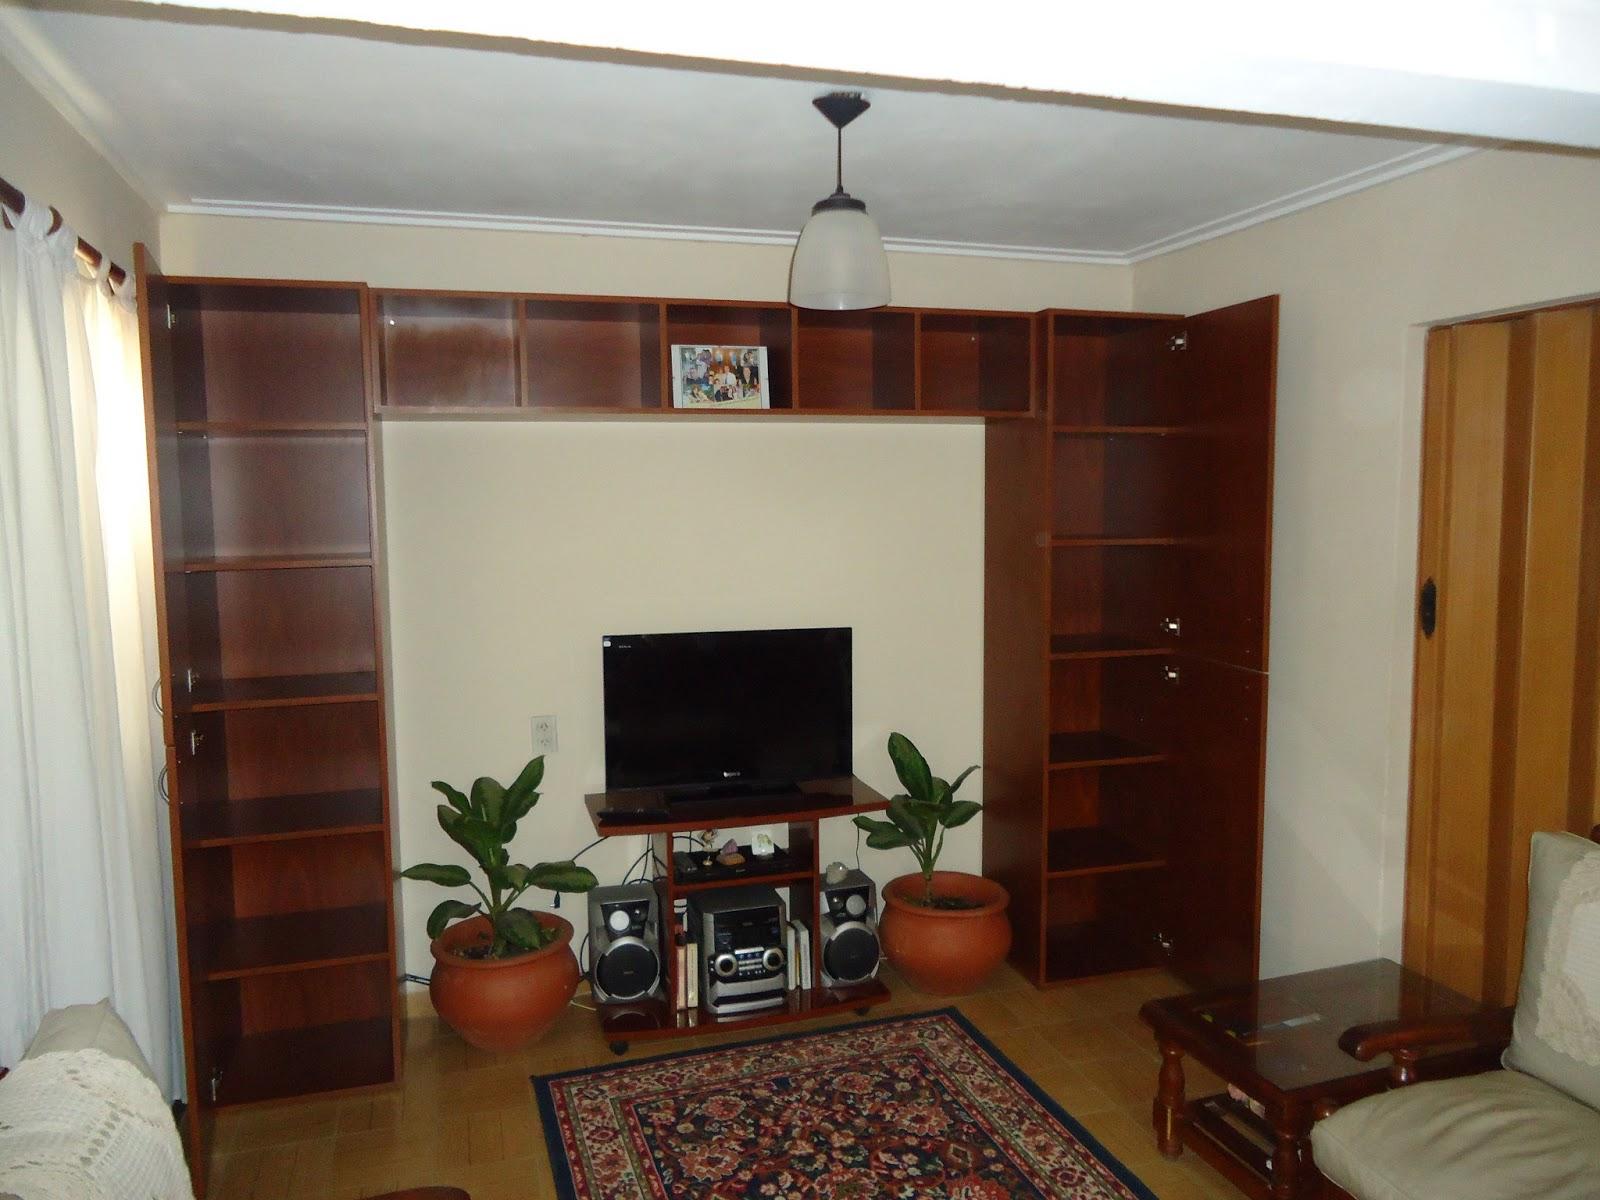 El detalle muebles dise ados a medida mueble a medida for Muebles para living